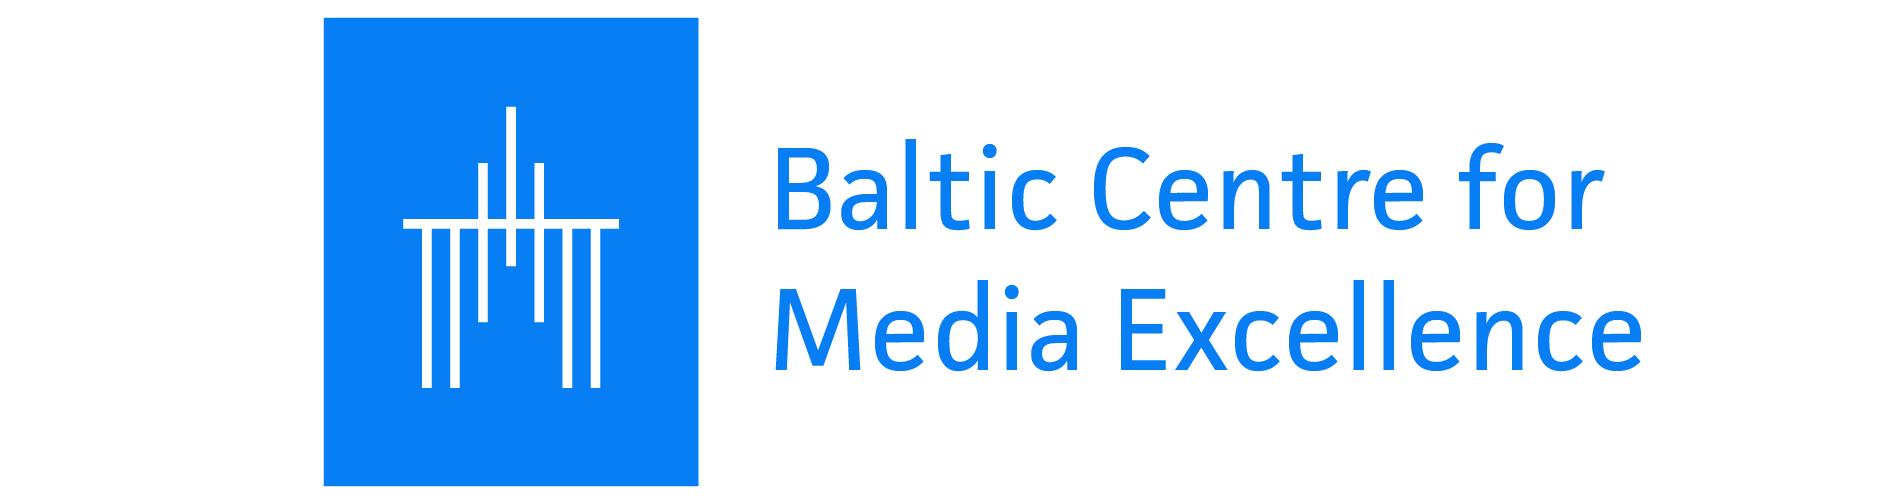 BCME-logo-en%20-%20Copy.png